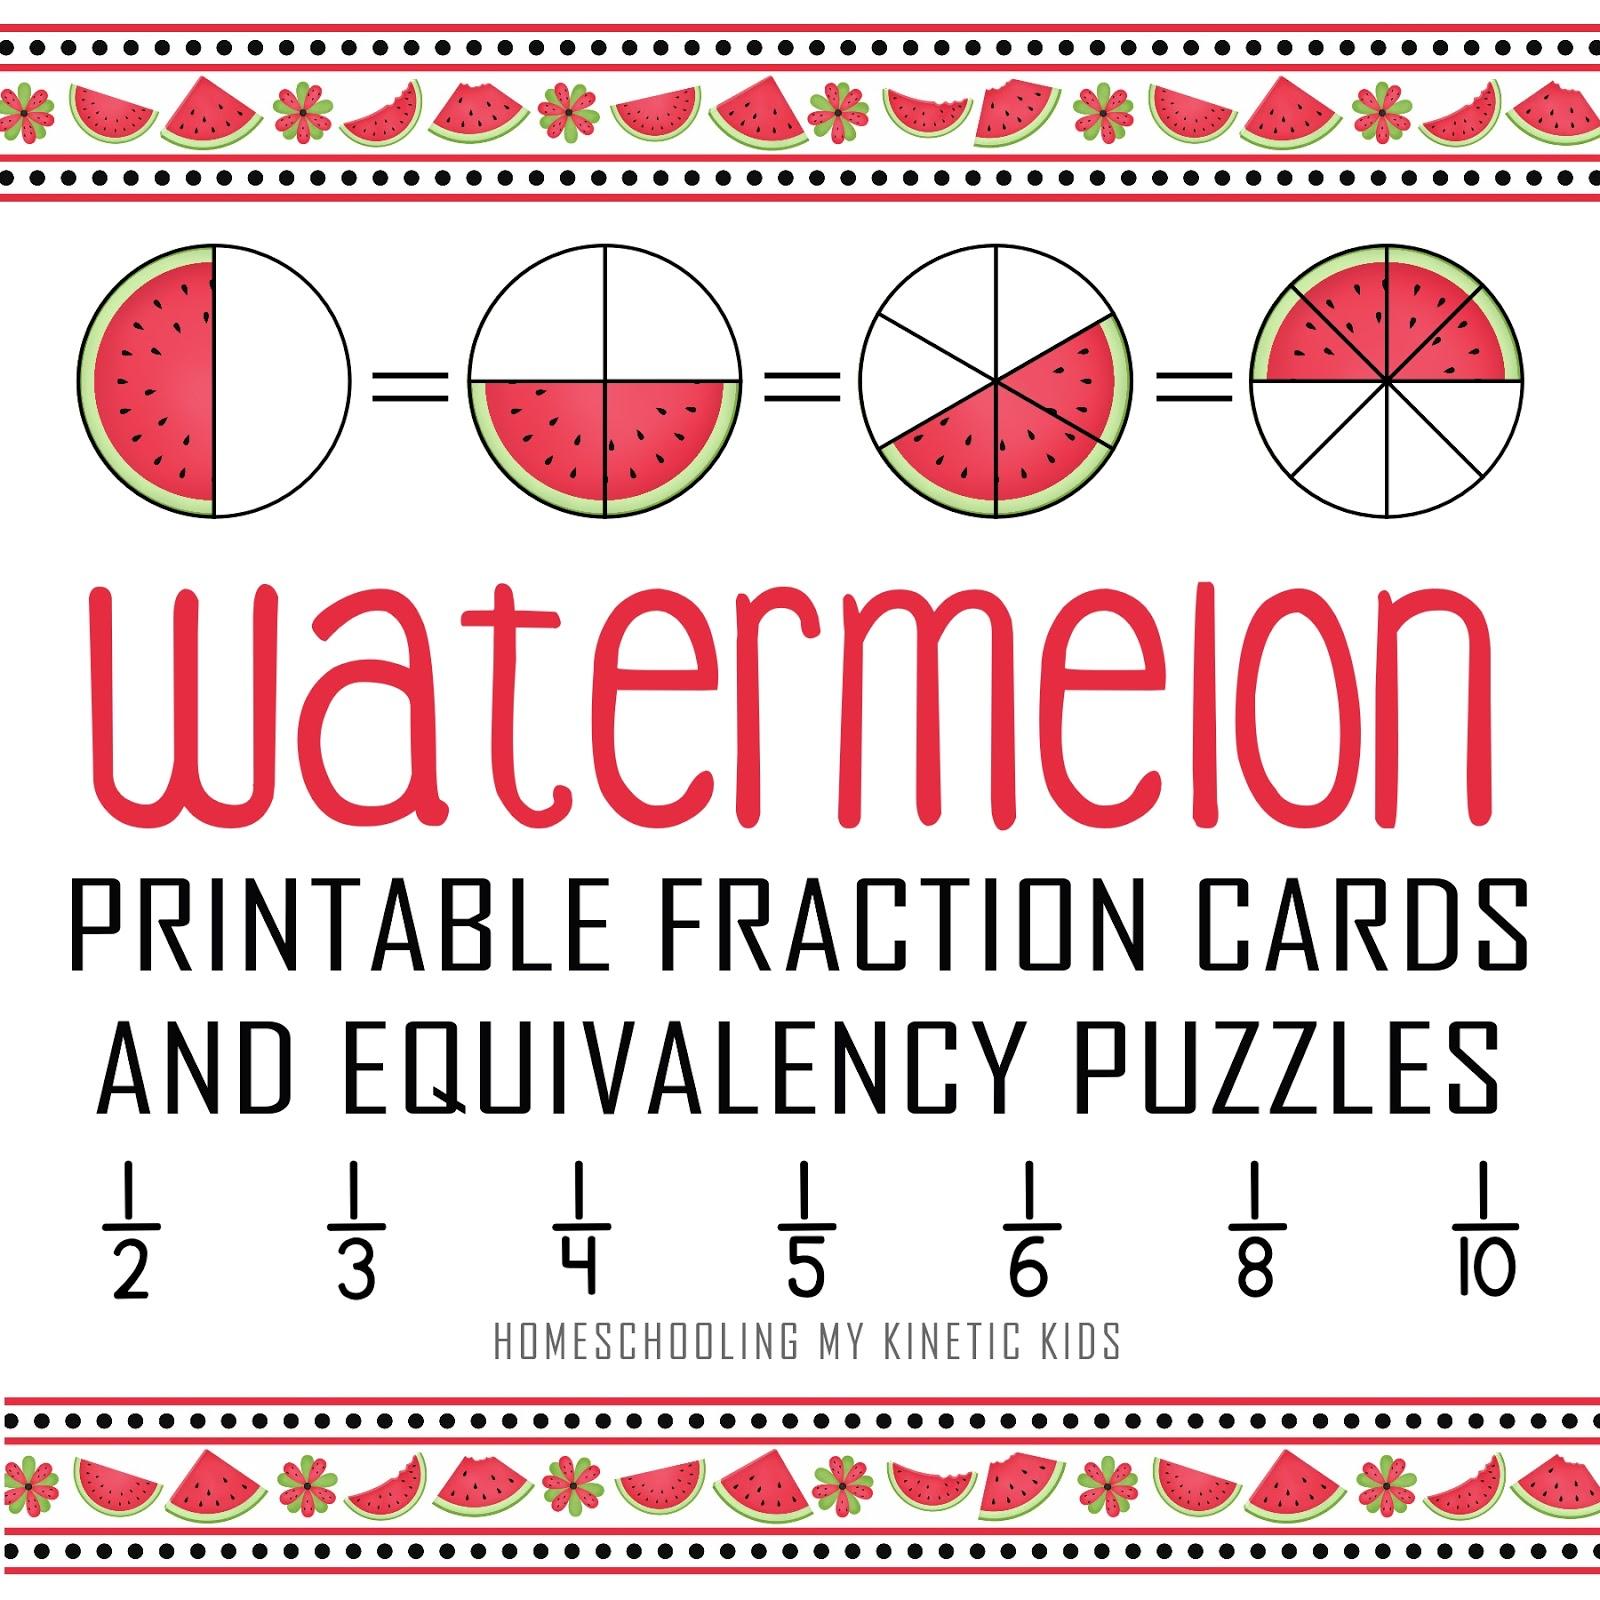 Watermelon 3 Part Fraction Cards